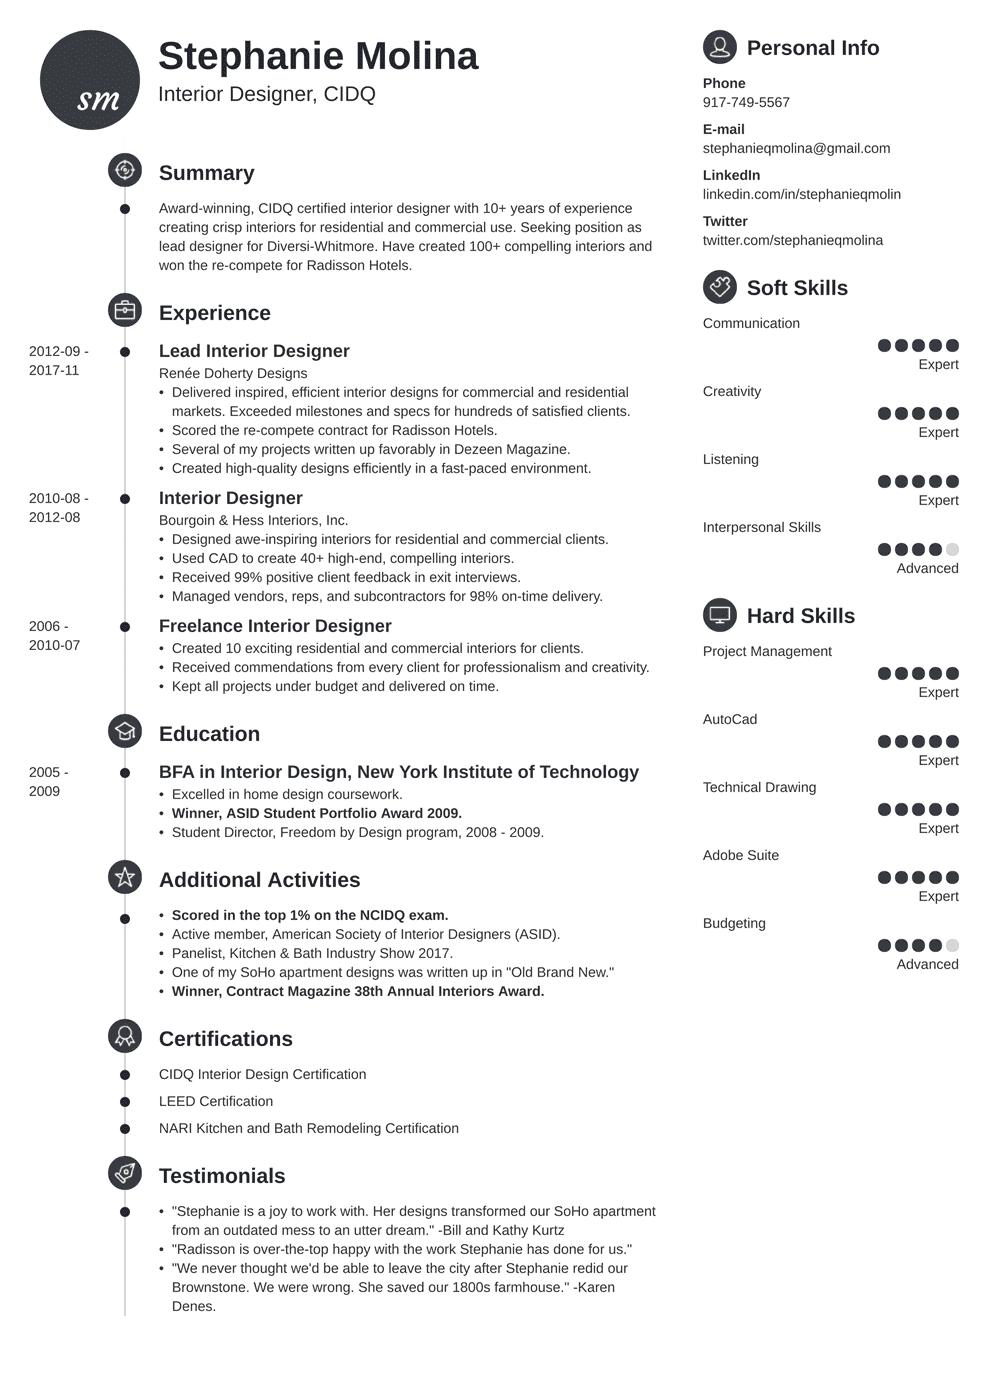 Interior Design Resume Examples [+Key Skills and